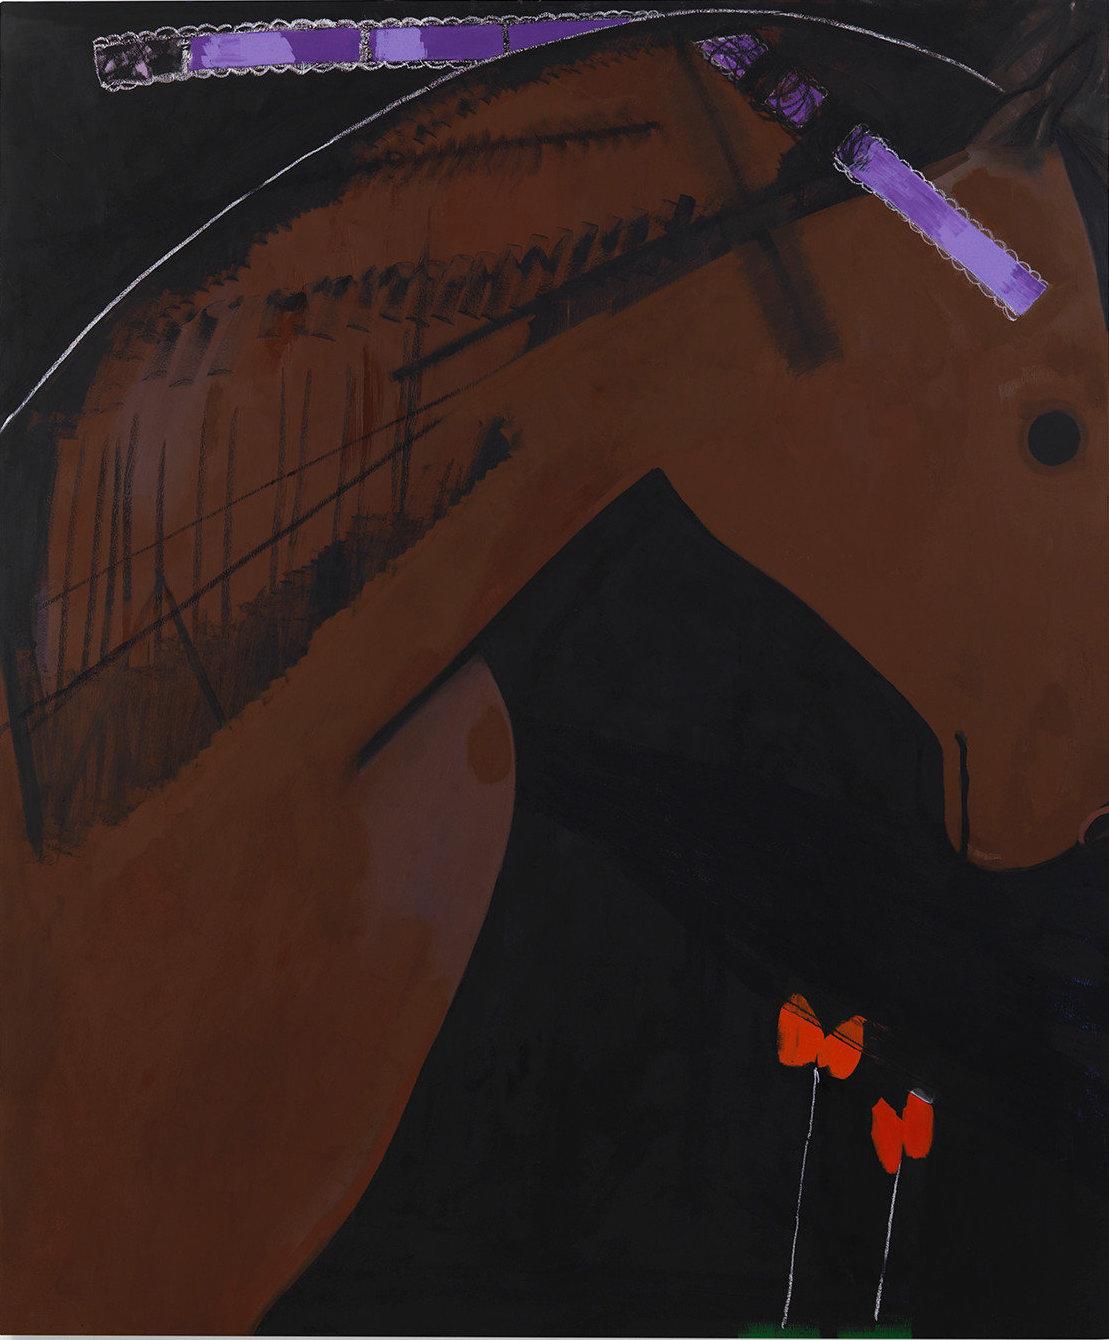 Ellen Berkenblit, Lilac, 2016, oil on linen, 77 x 64 inches (courtesy of Anton Kern Gallery)